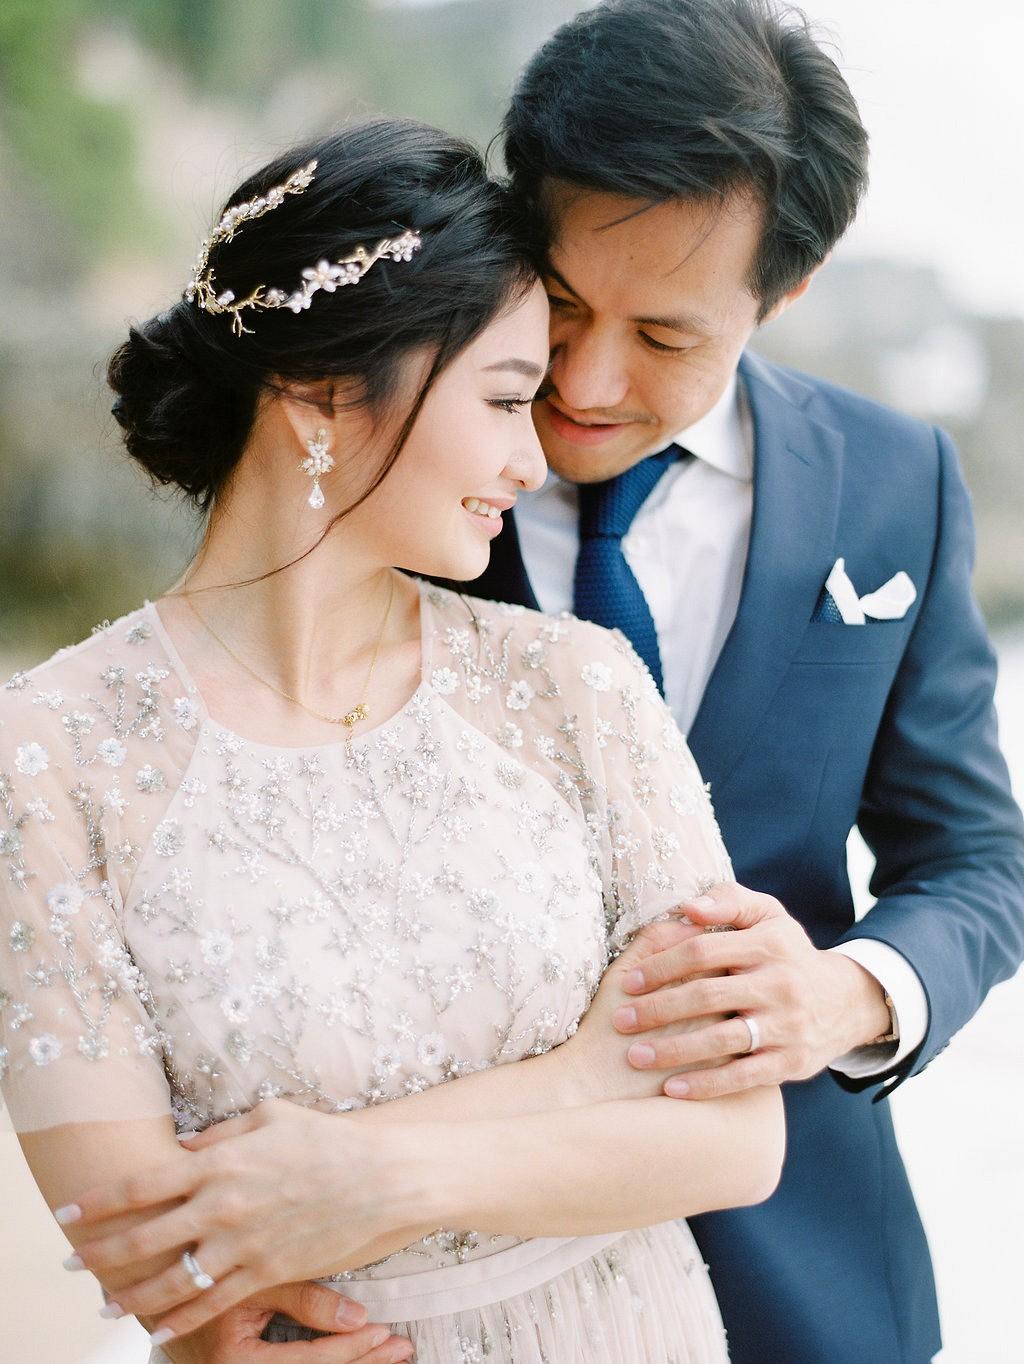 Mia and David's Cliff Top Wedding in Bali